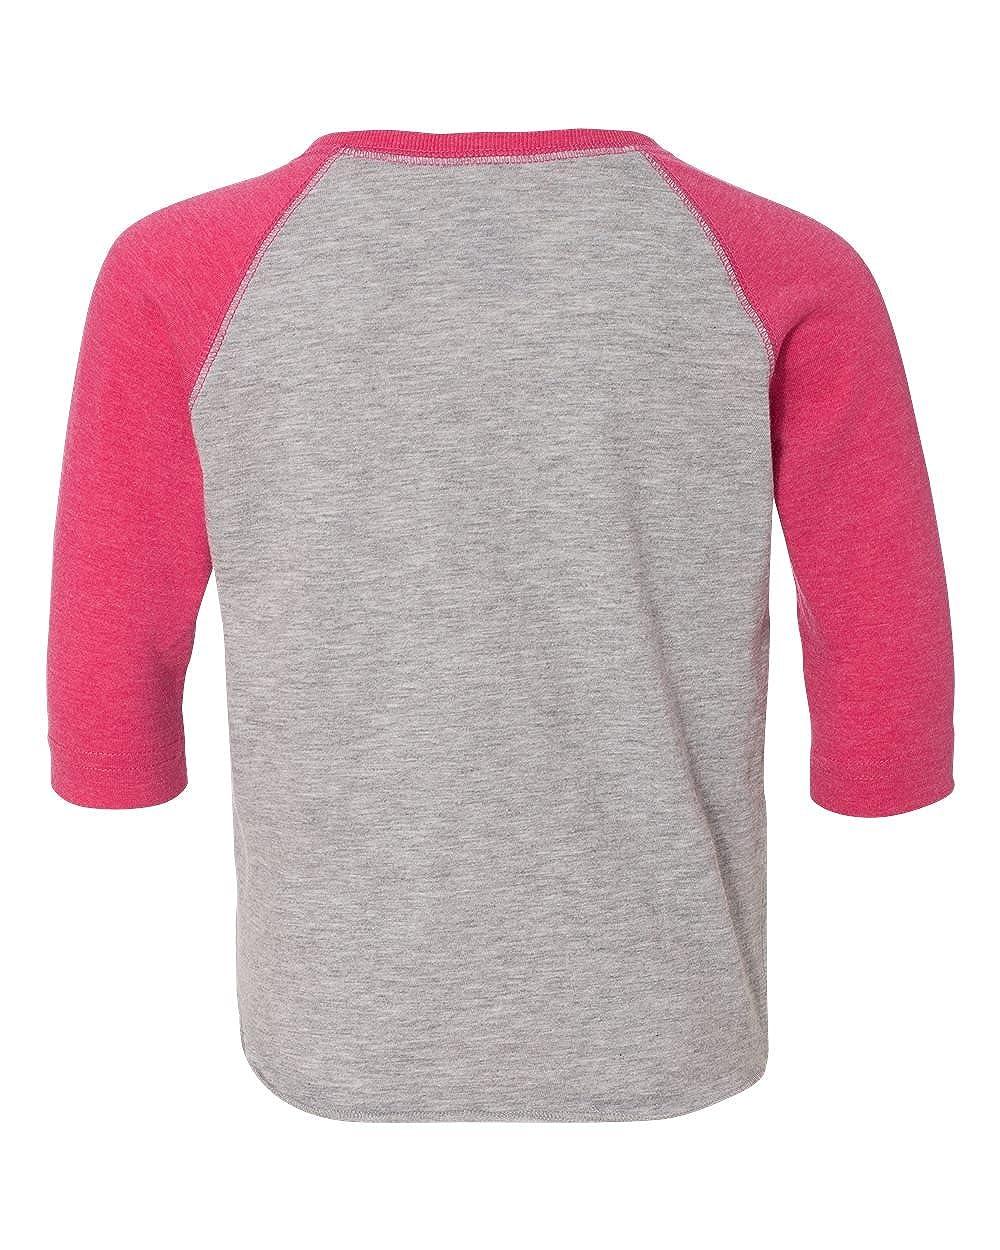 Clementine Toddler Baseball Fine Jersey T-Shirt RS3330 VN HTH//VN HT 2T